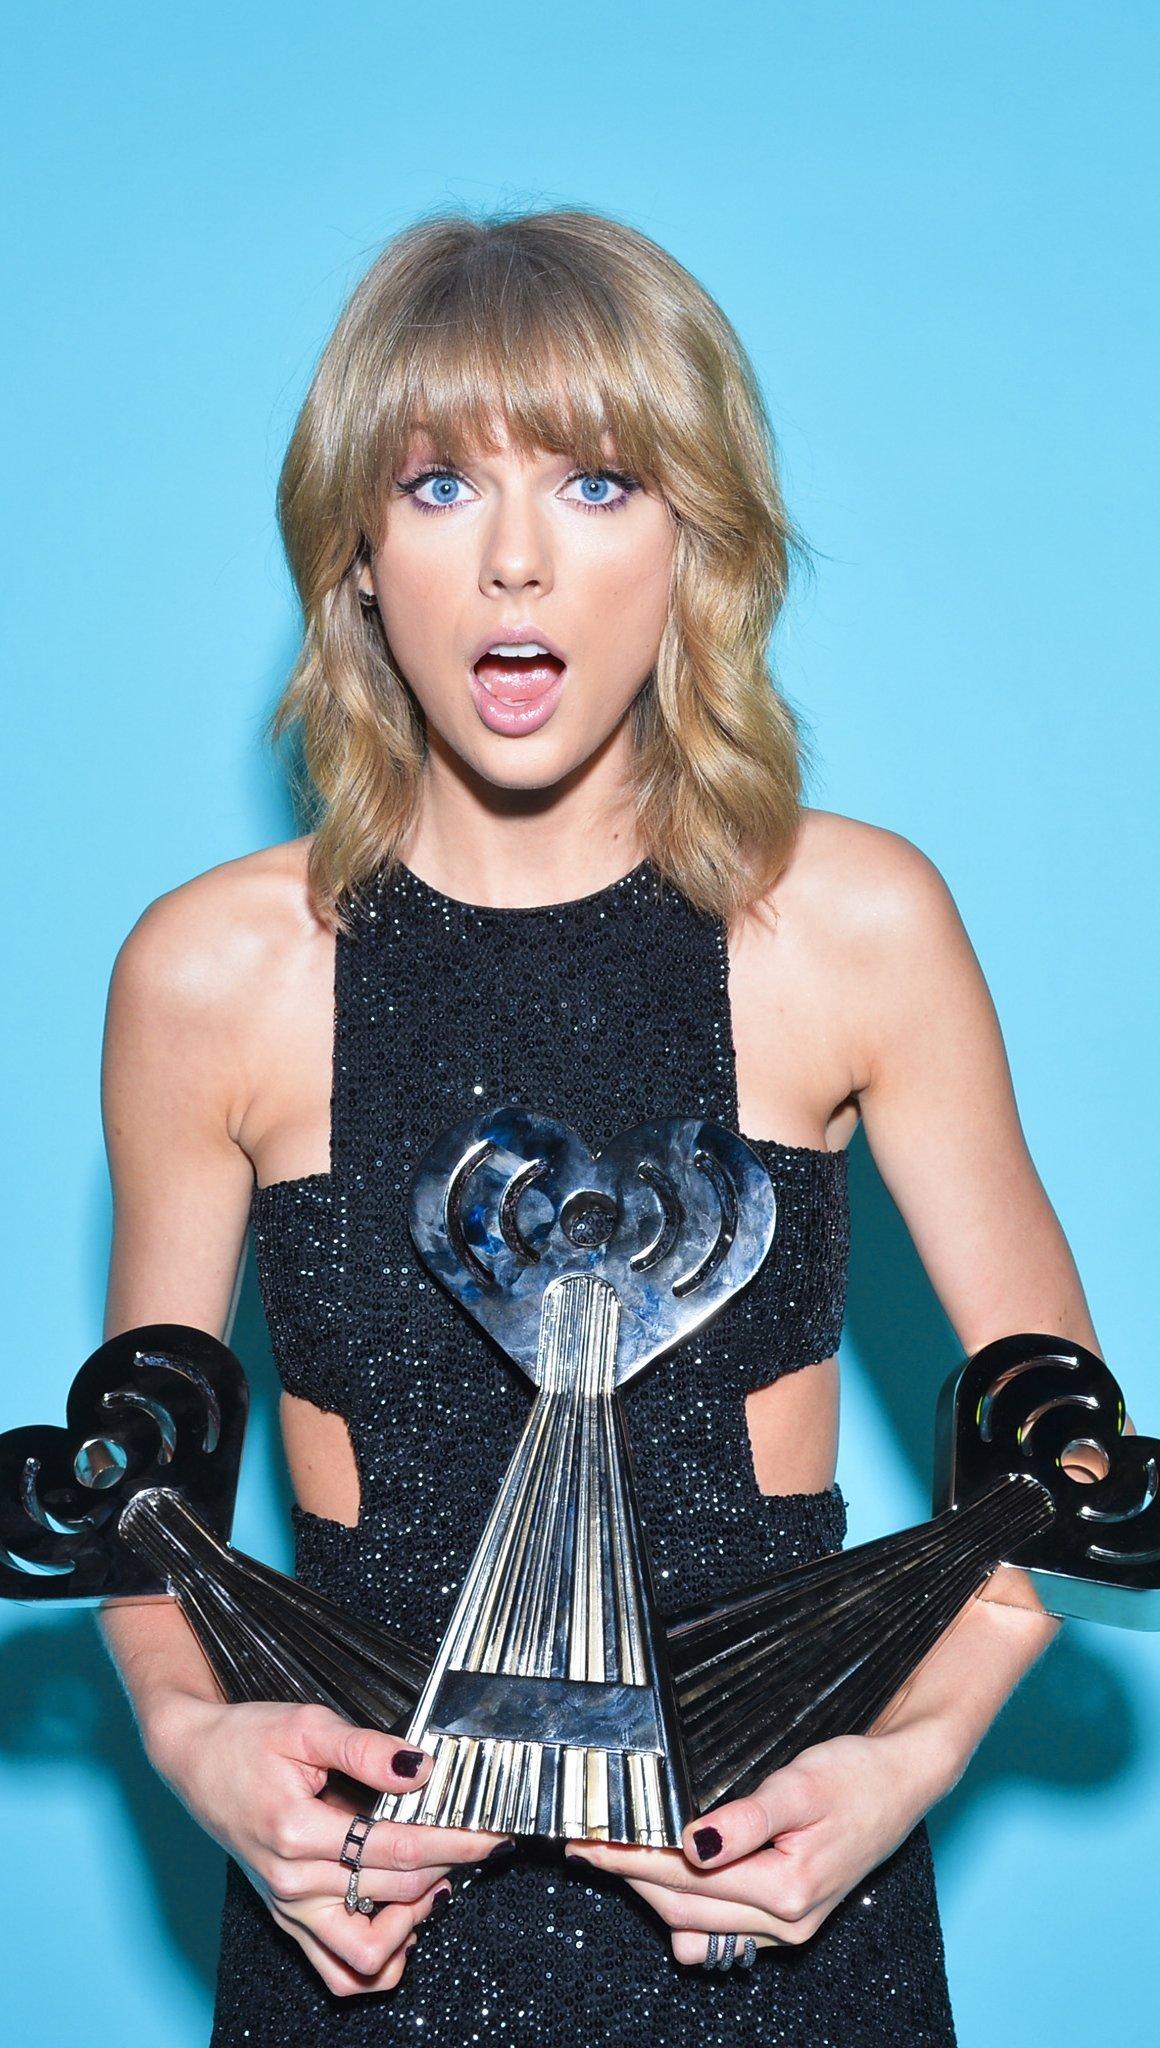 Fondos de pantalla Taylor Swift con premios iHeart Vertical